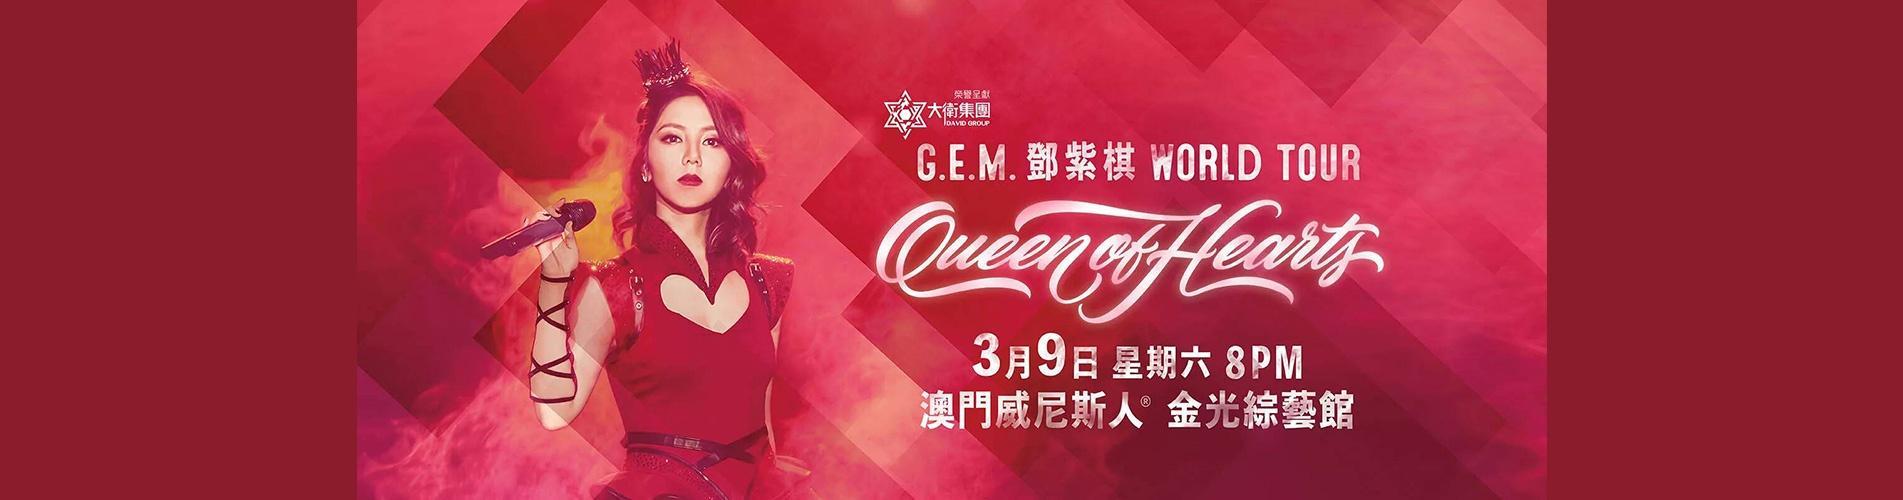 G.E.M. 鄧紫棋 Queen of Hearts世界巡迴演唱會 - 澳門站